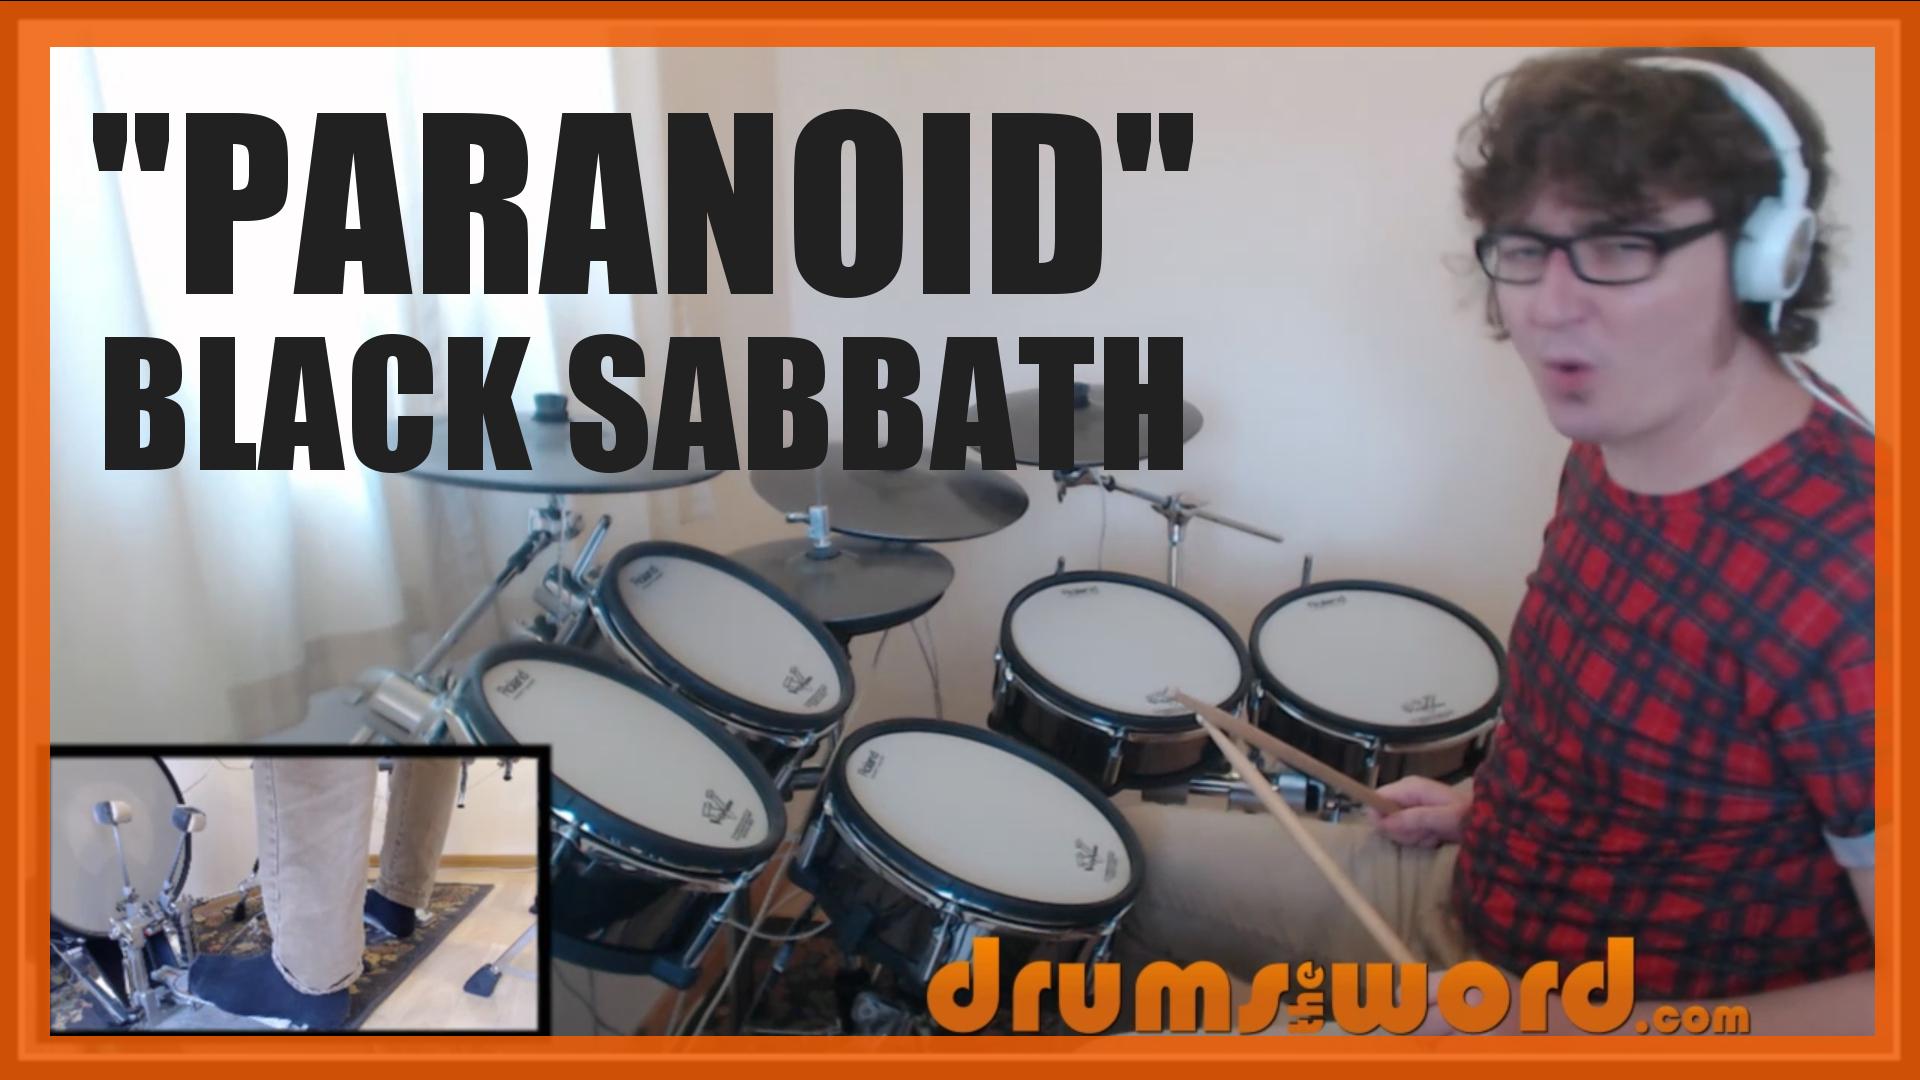 """Paranoid"" - (Black Sabbath) Full-Song Video Drum Lesson Notation Chart Transcription Sheet Music Drum Lesson"